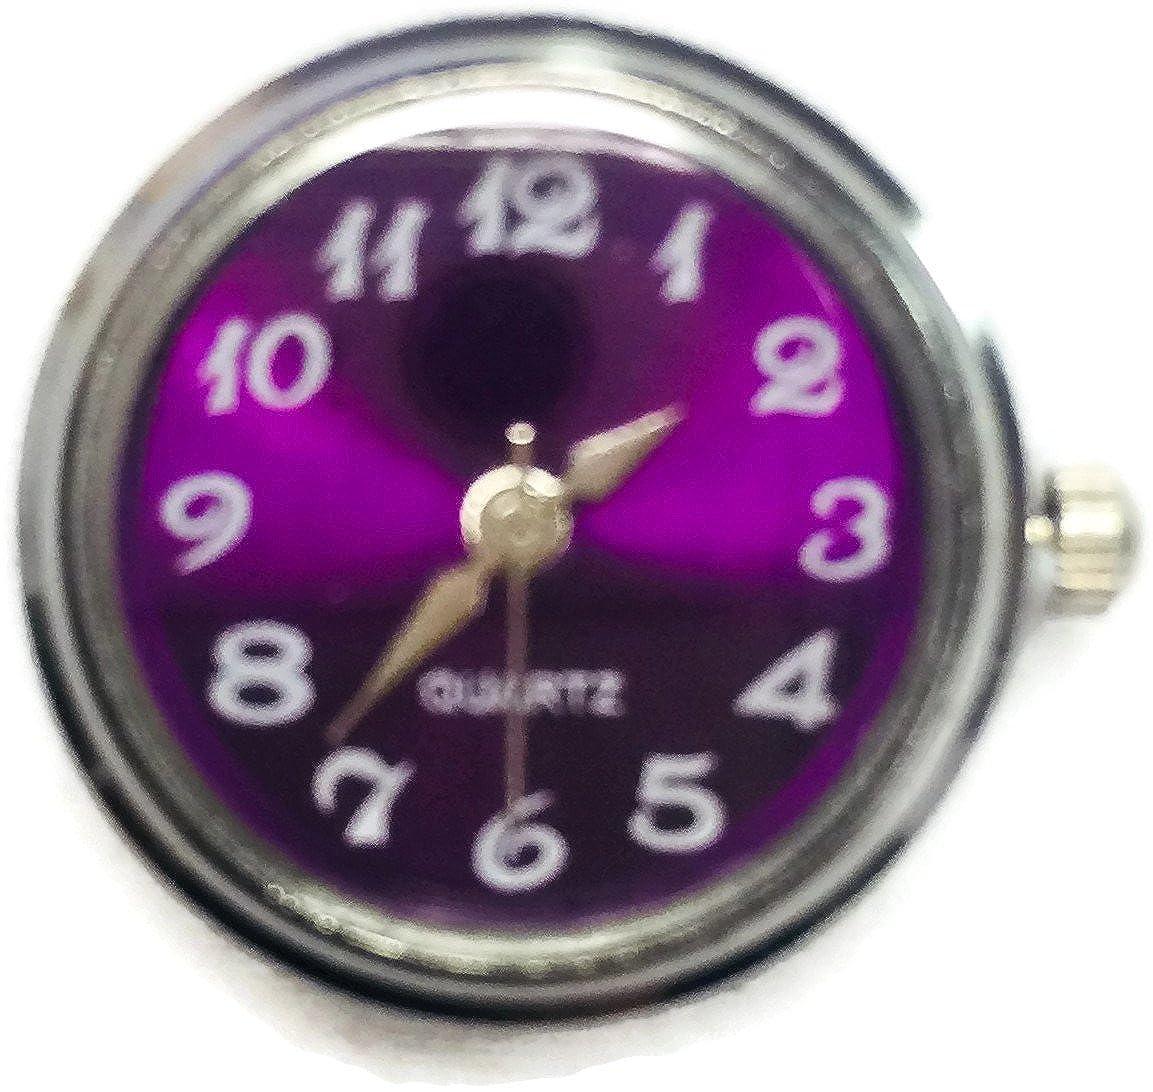 Purple Quartz WatchダイヤルWind Up Real Working Watch 18 mm – 20 mmファッションスナップジュエリースナップチャーム B077PJ9SM9